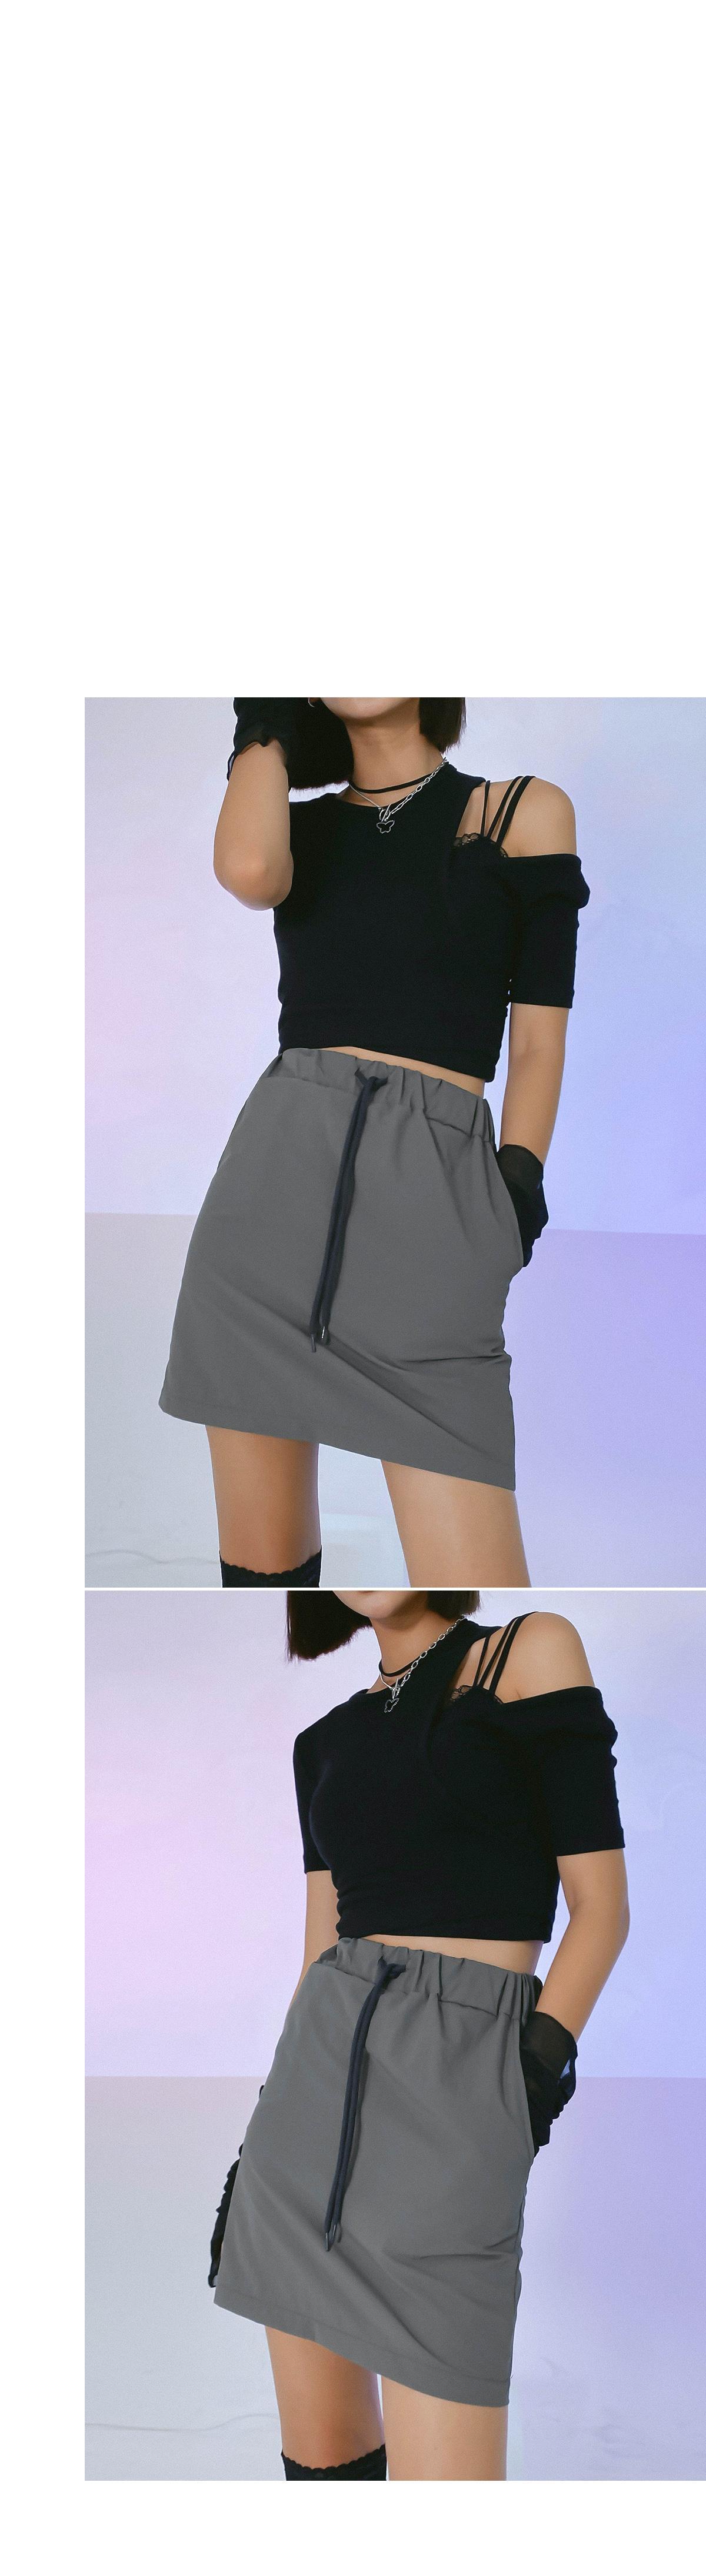 Jerry mini skirt